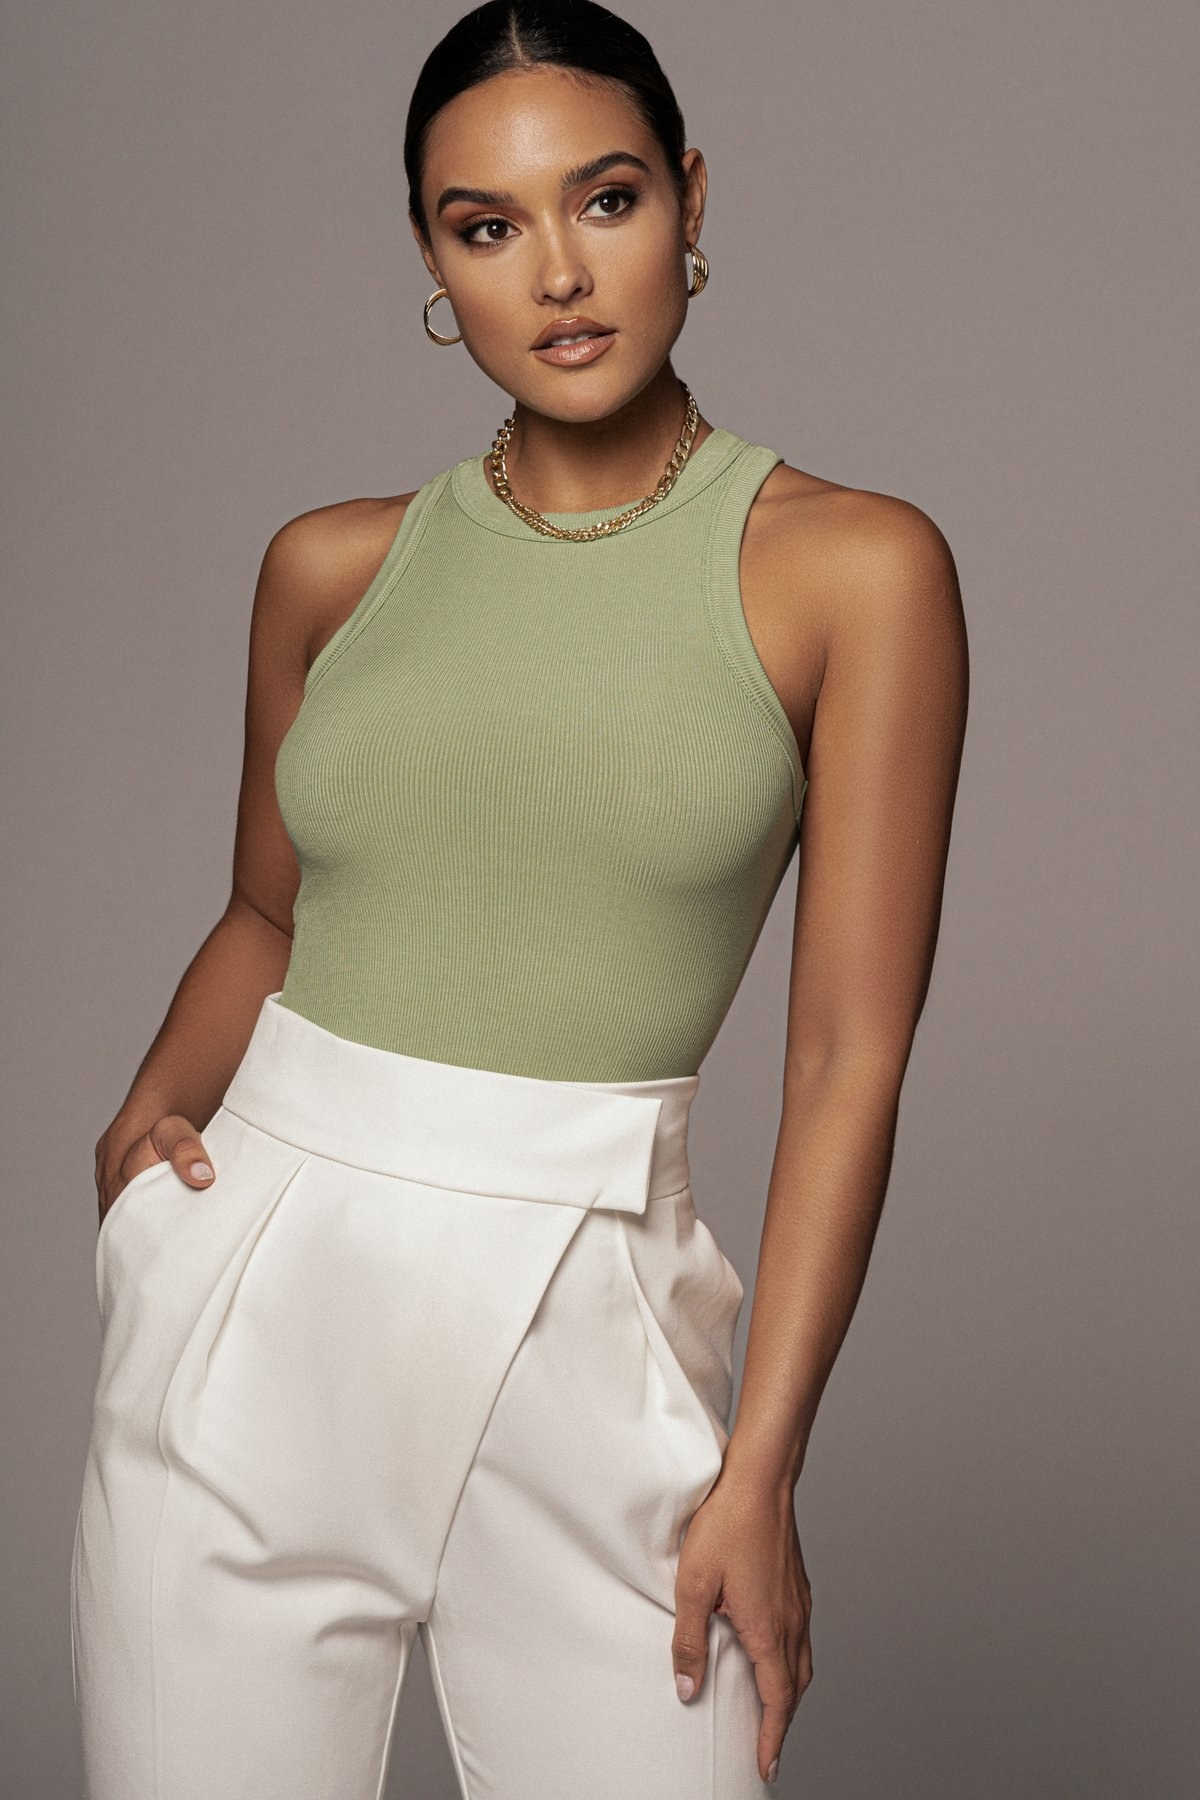 A model wearing the green tank